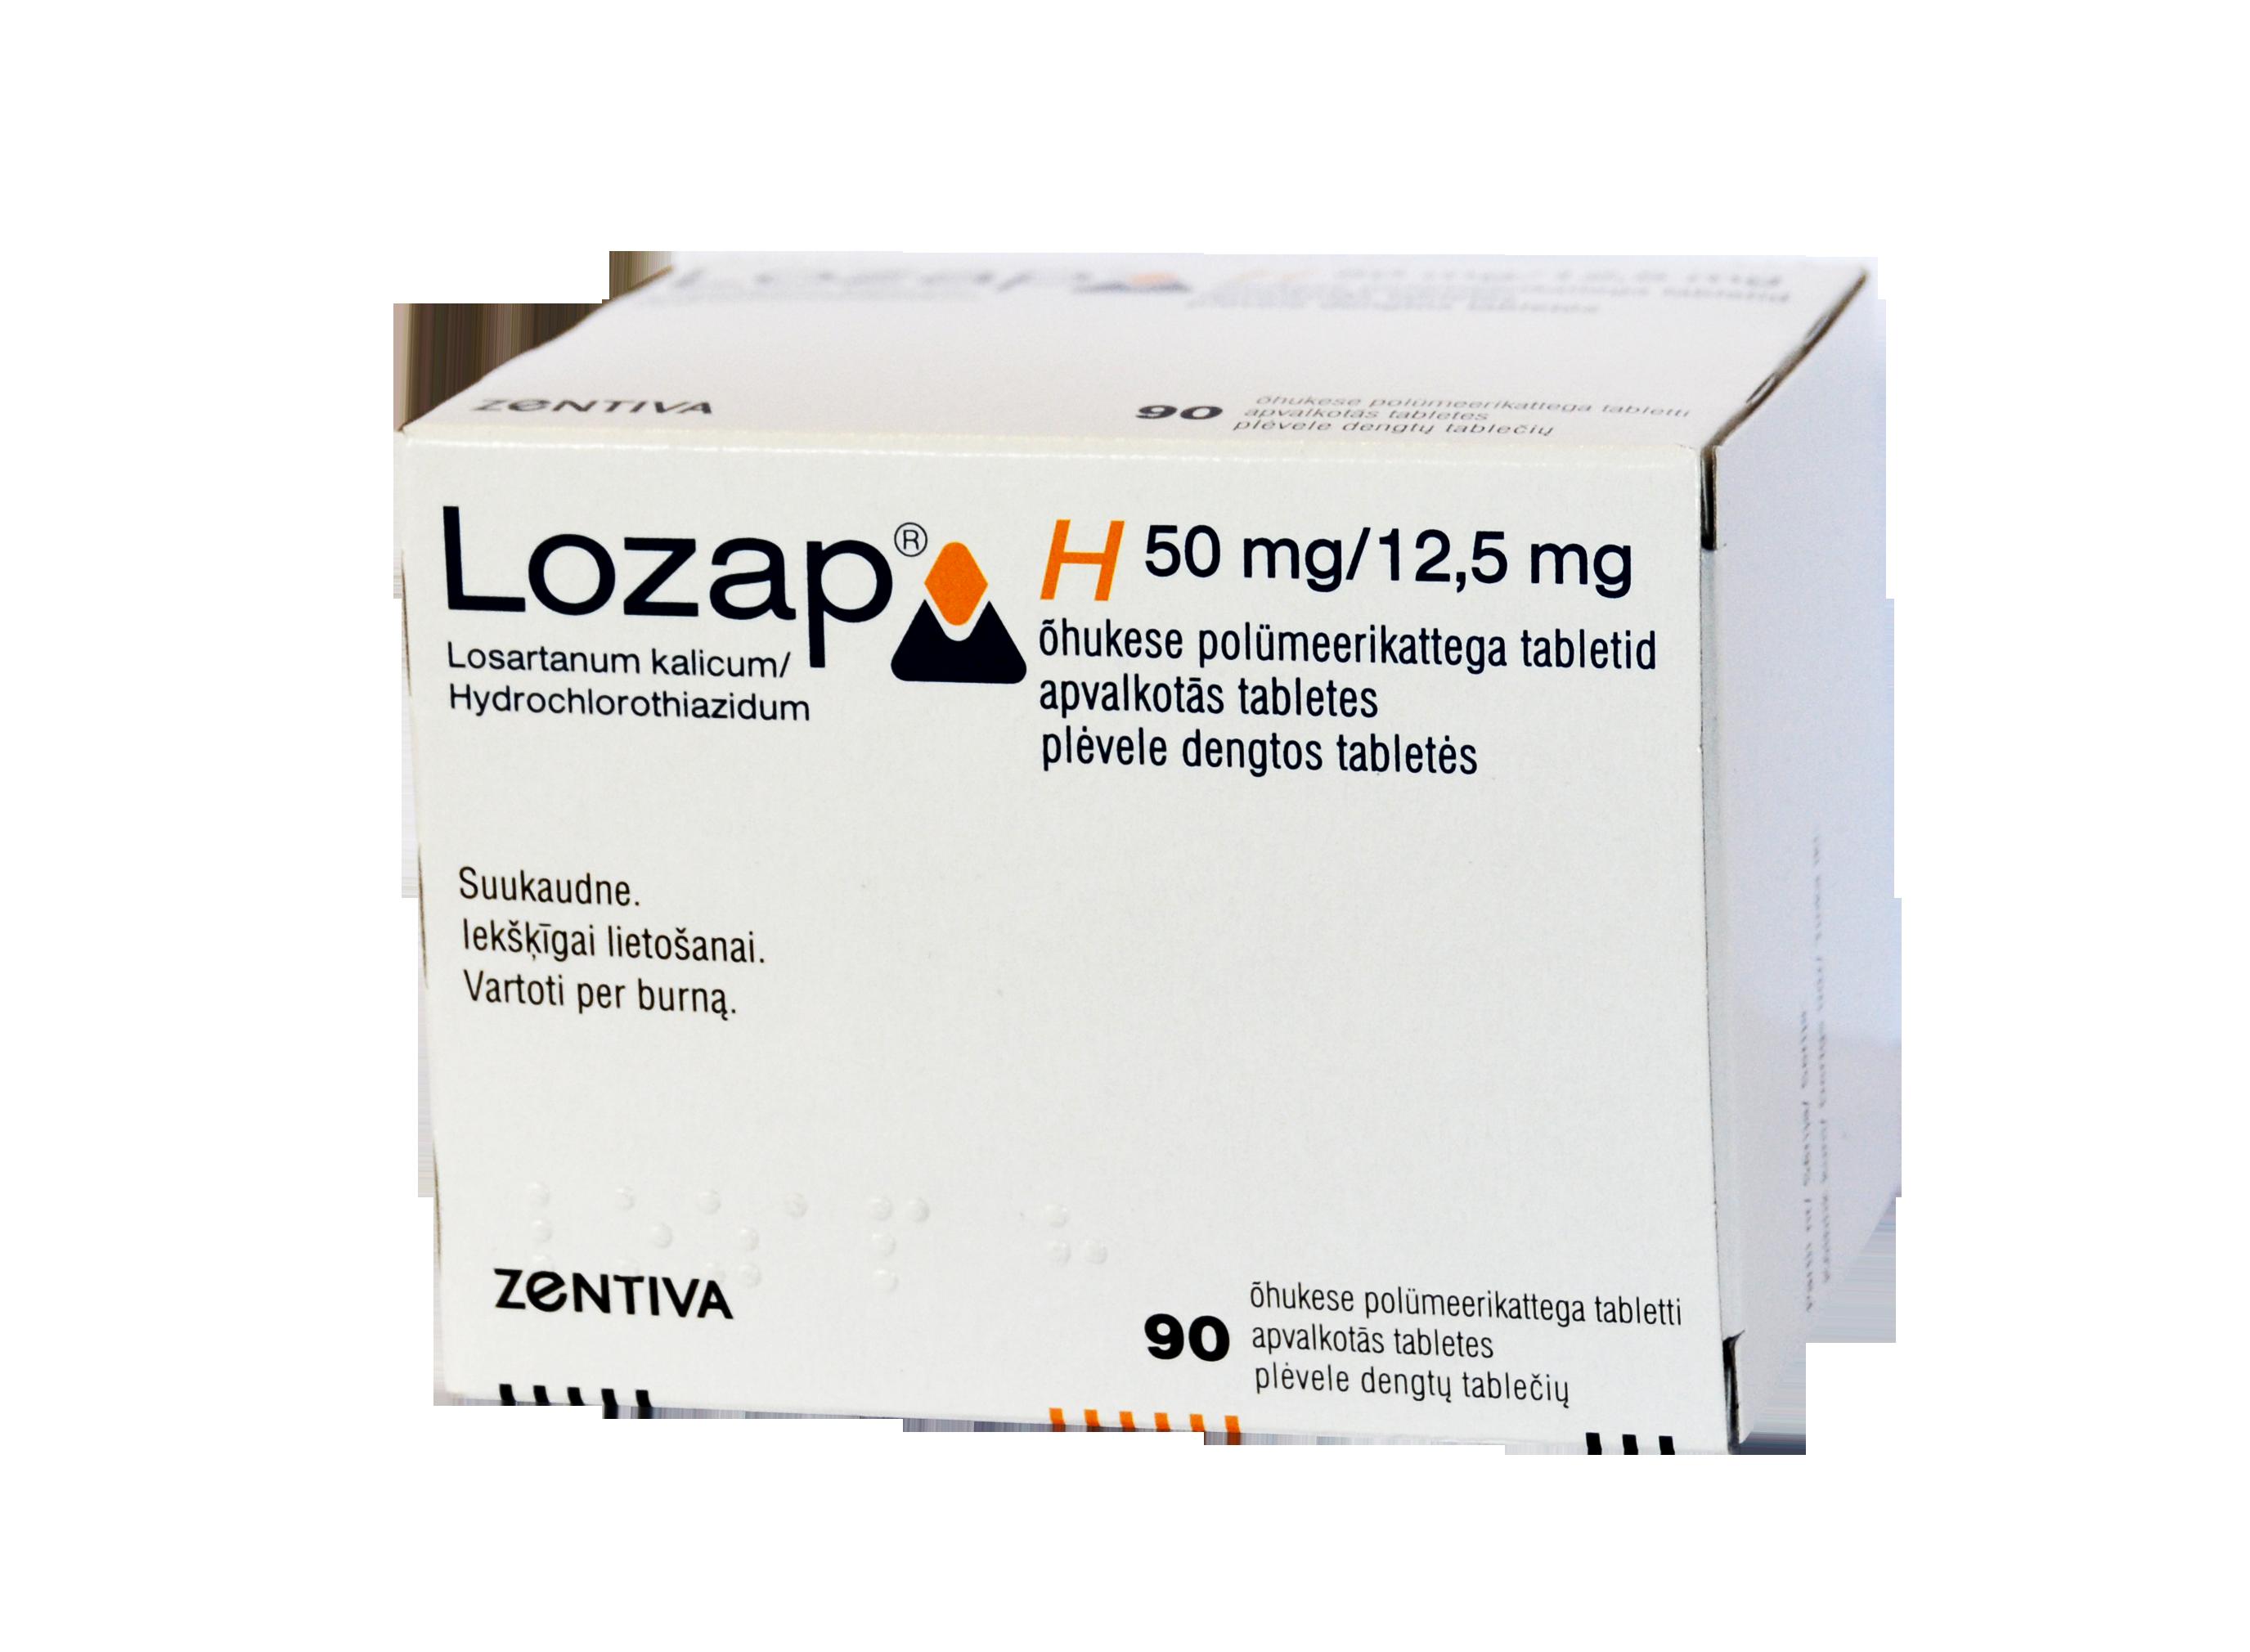 hipertenzija lozap plus)